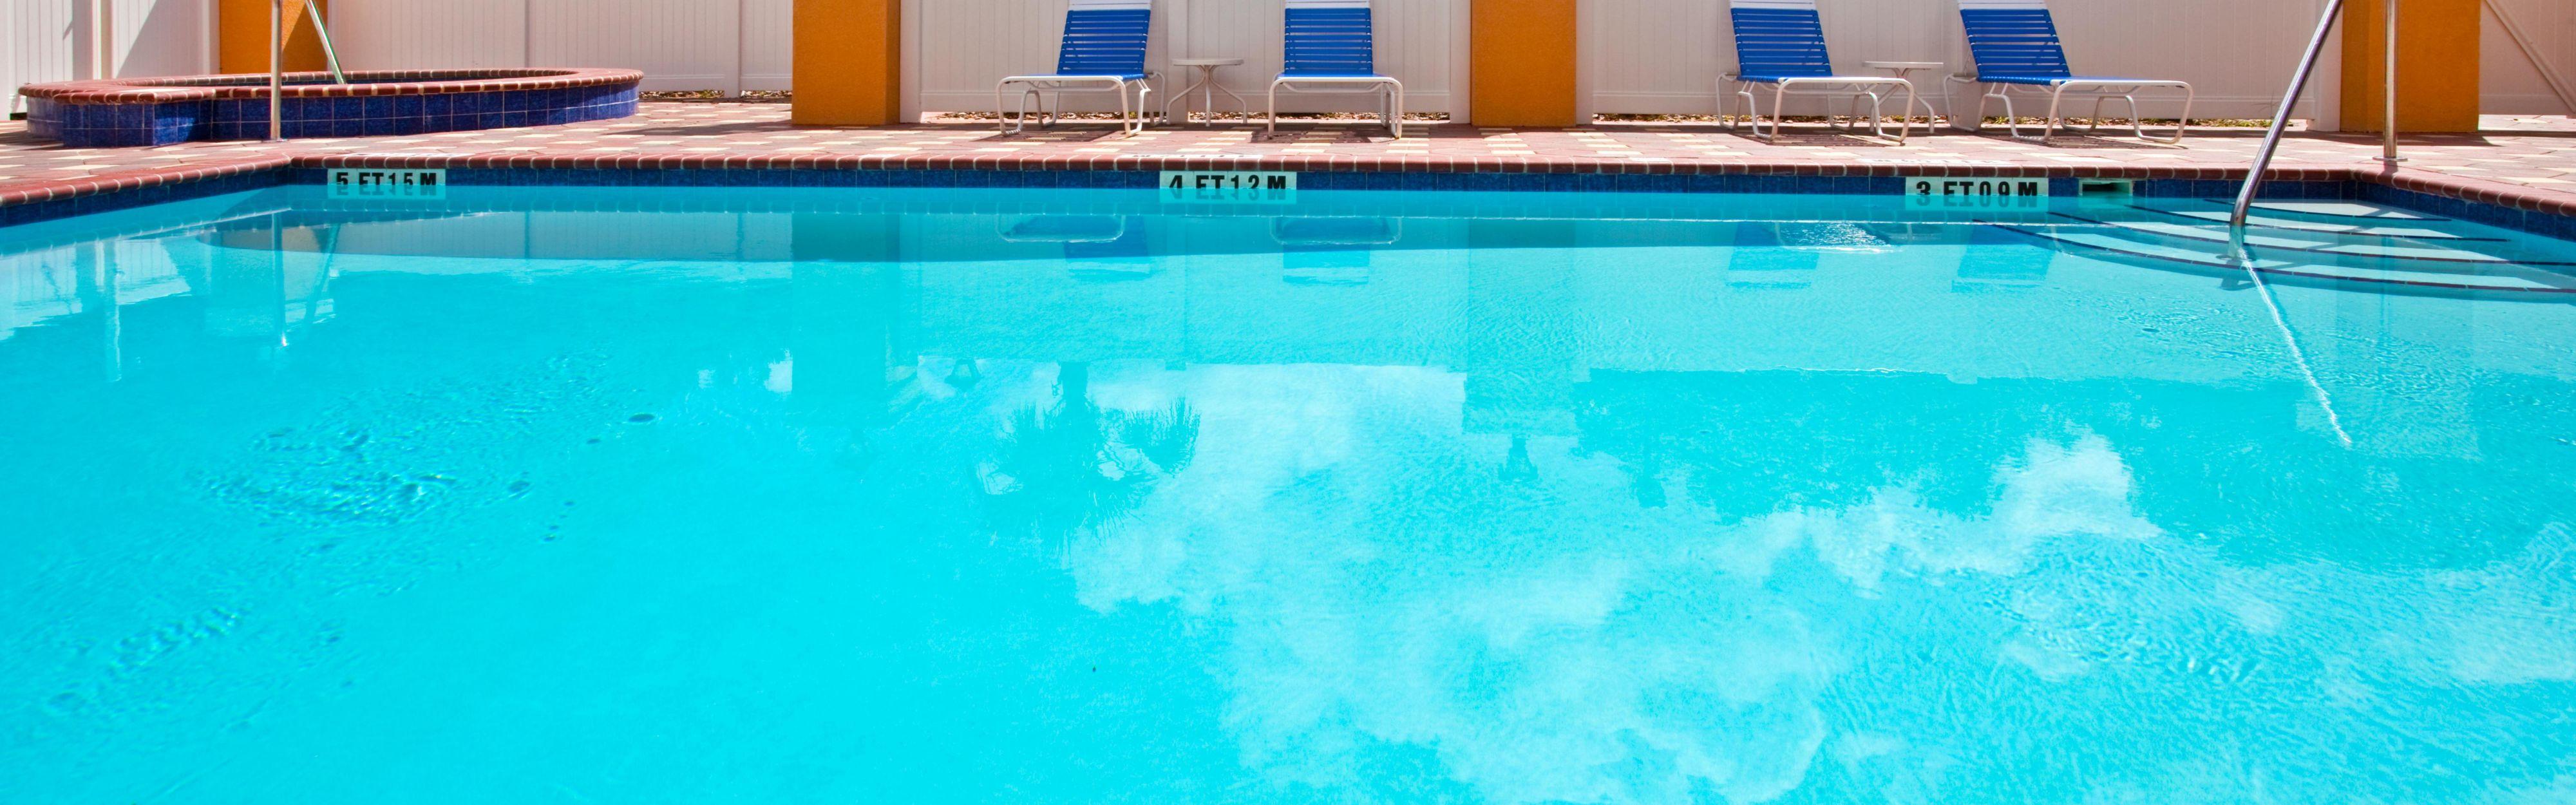 Holiday Inn Express & Suites Brooksville-I-75 image 2